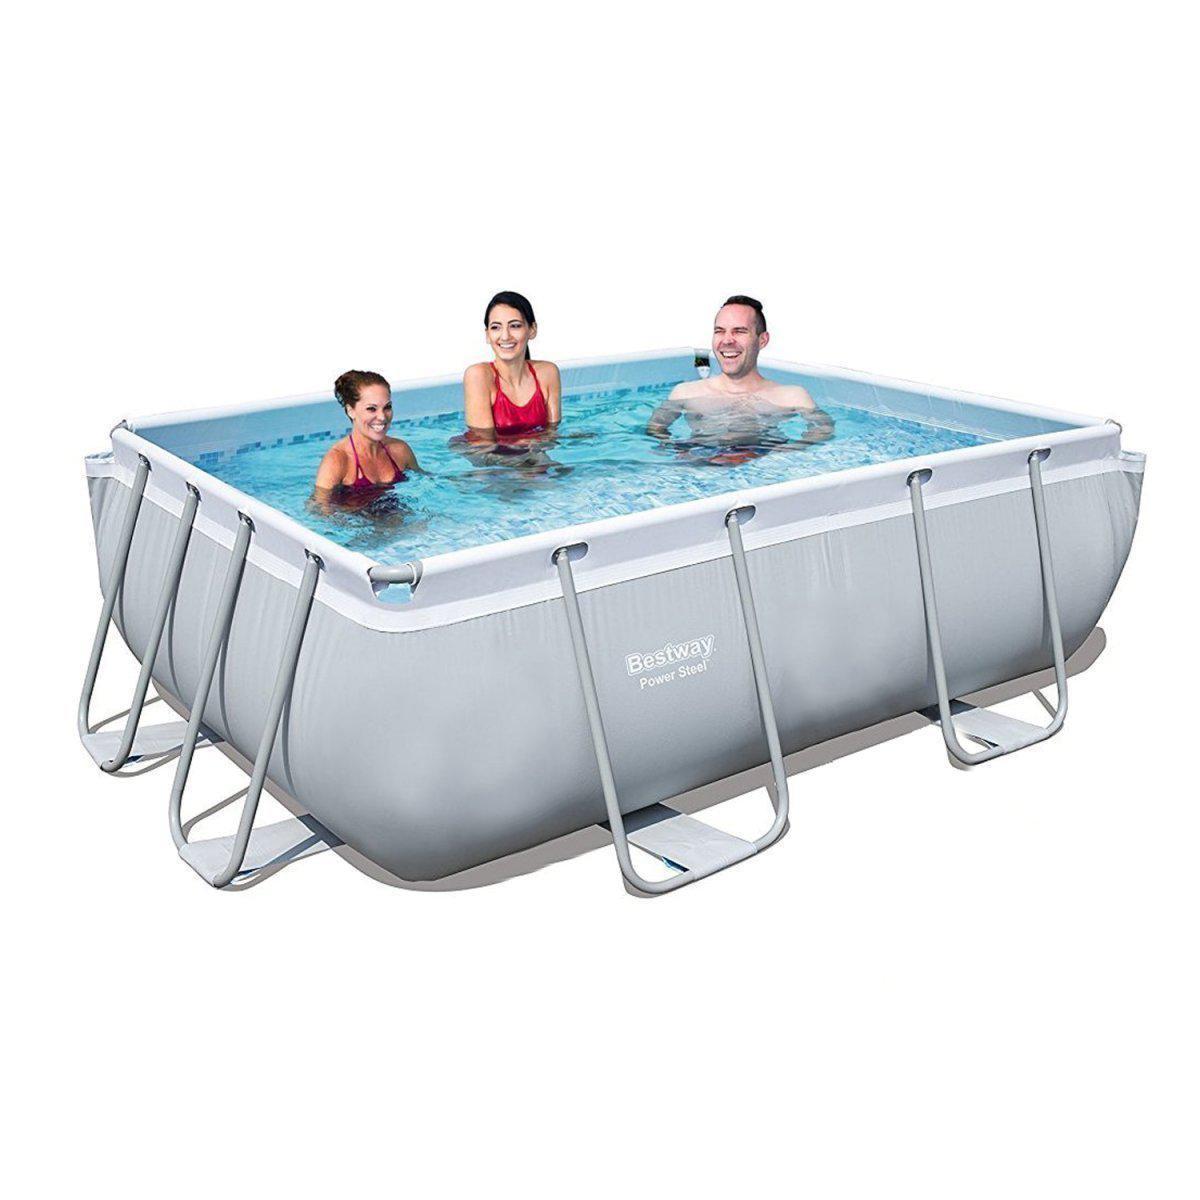 Каркасный бассейн Bestway 56629, 282 х 196 х 84 см (1 248 л/ч, дозатор)